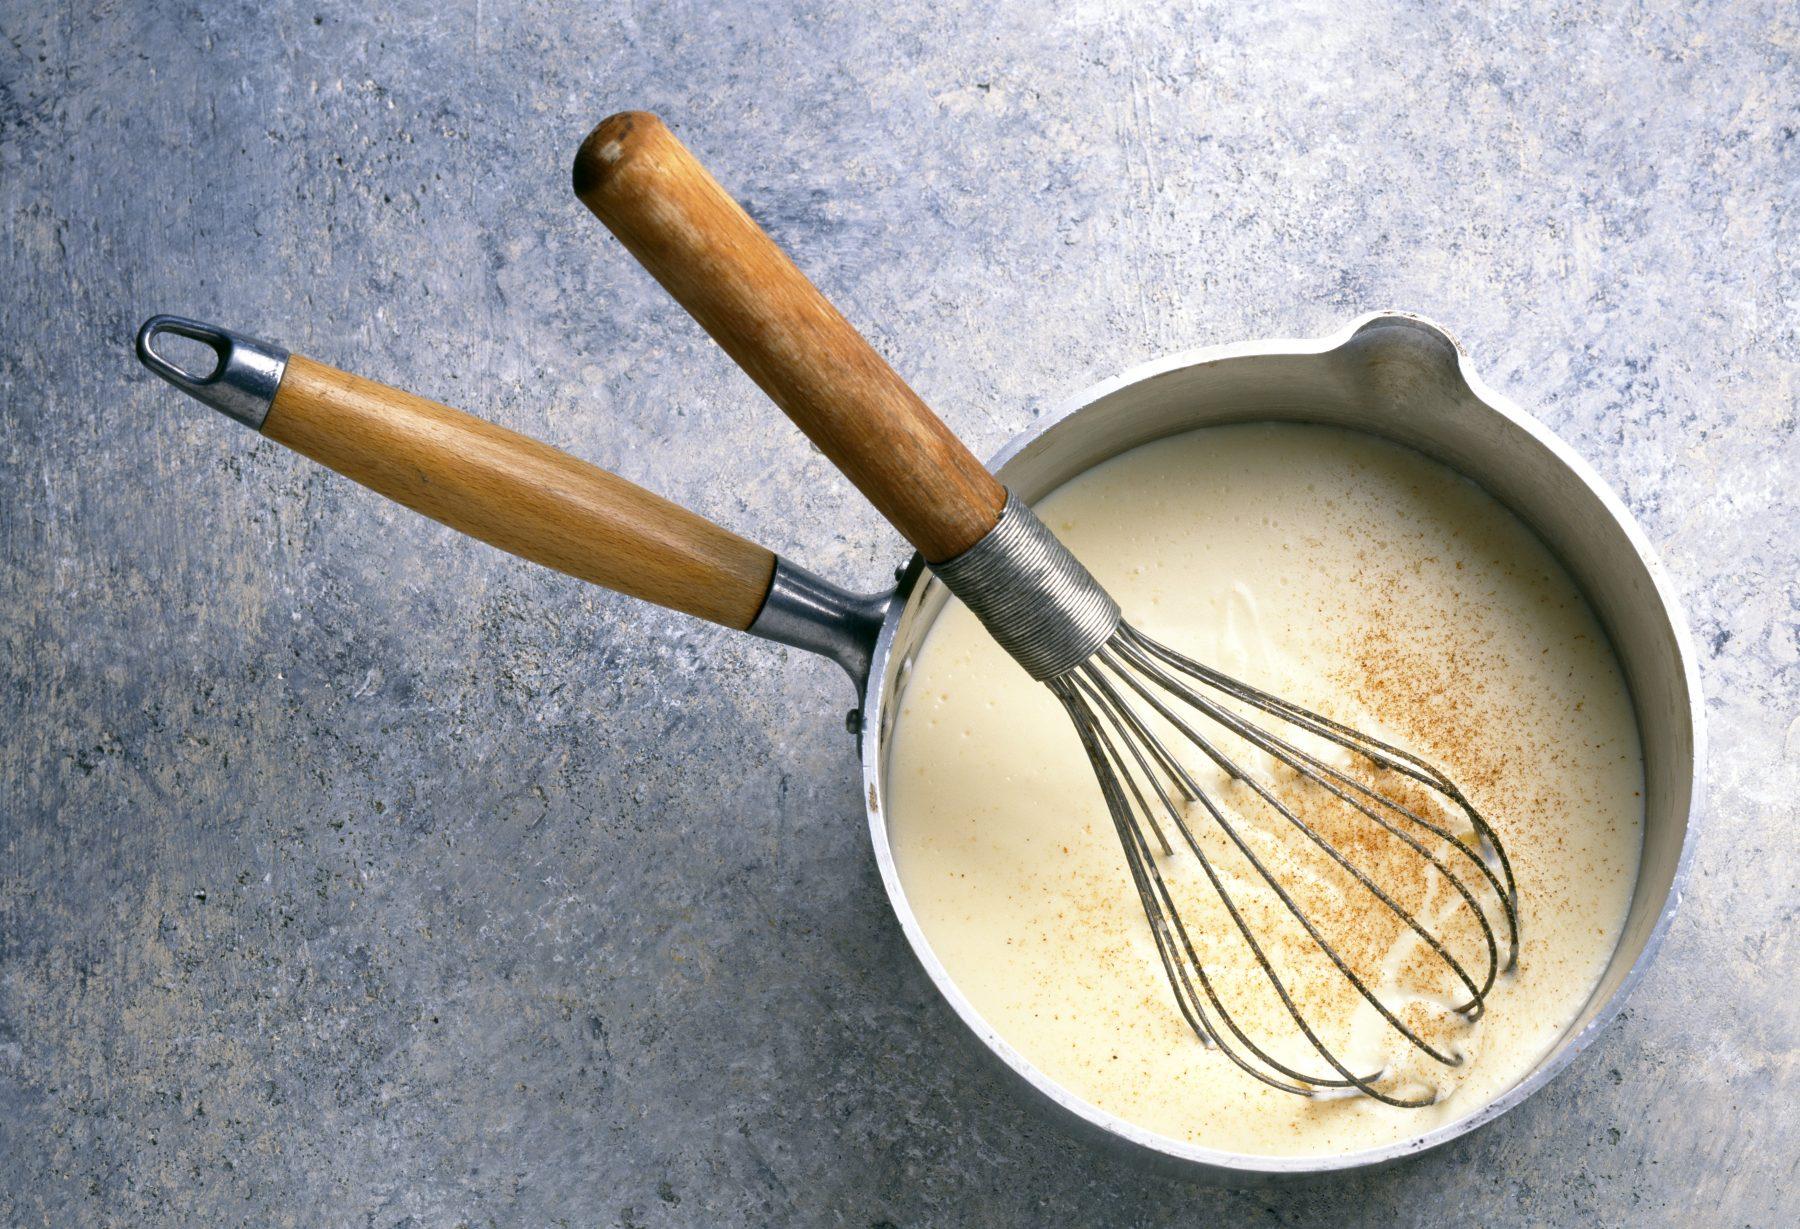 sauce bechamel - Sauce Béchamel traditionnelle